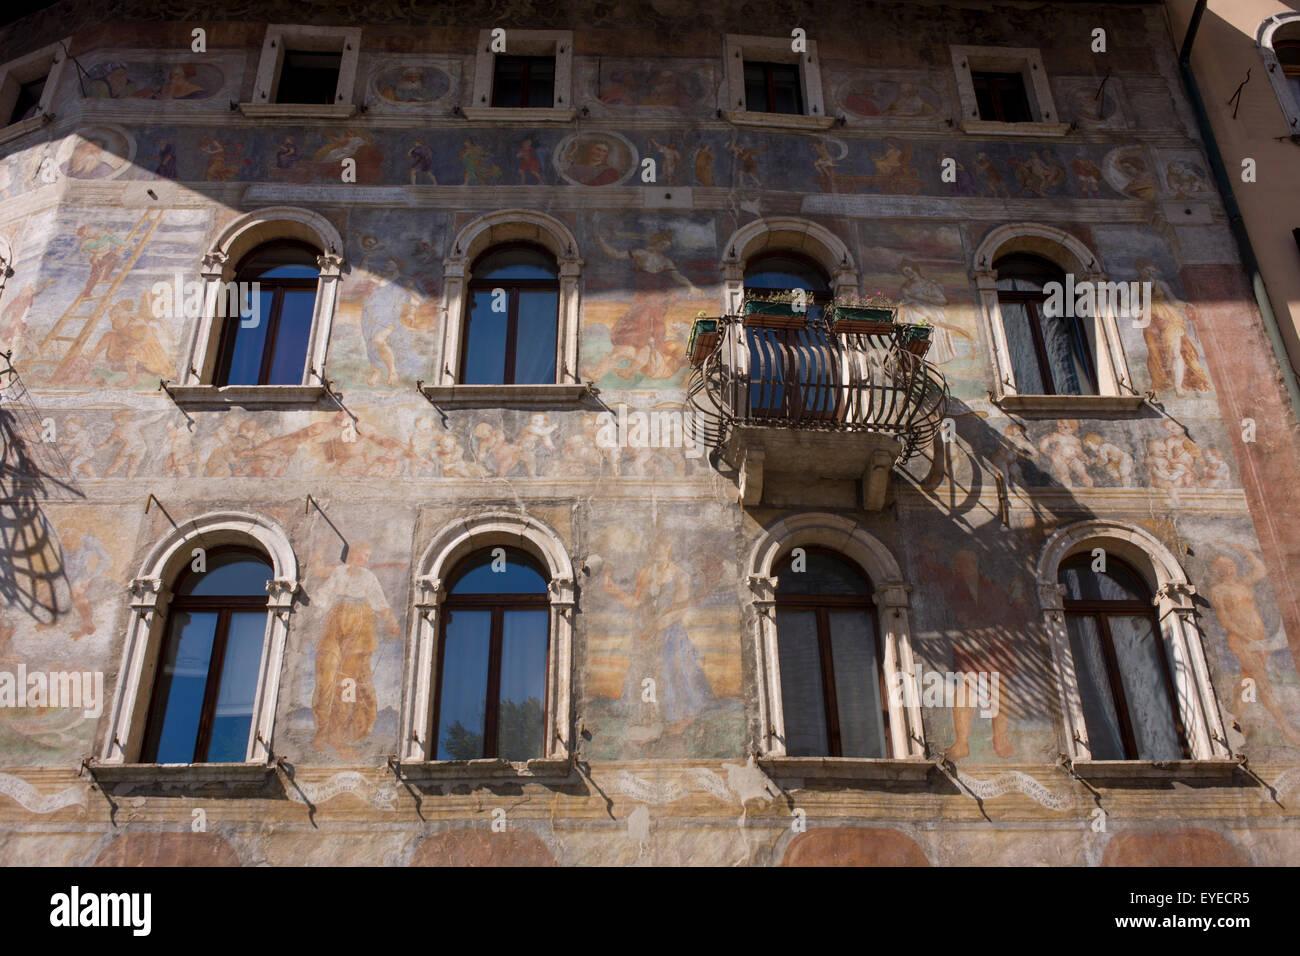 Fresco facades on historic buildings in Piazza Duomo, Trento. Stock Photo